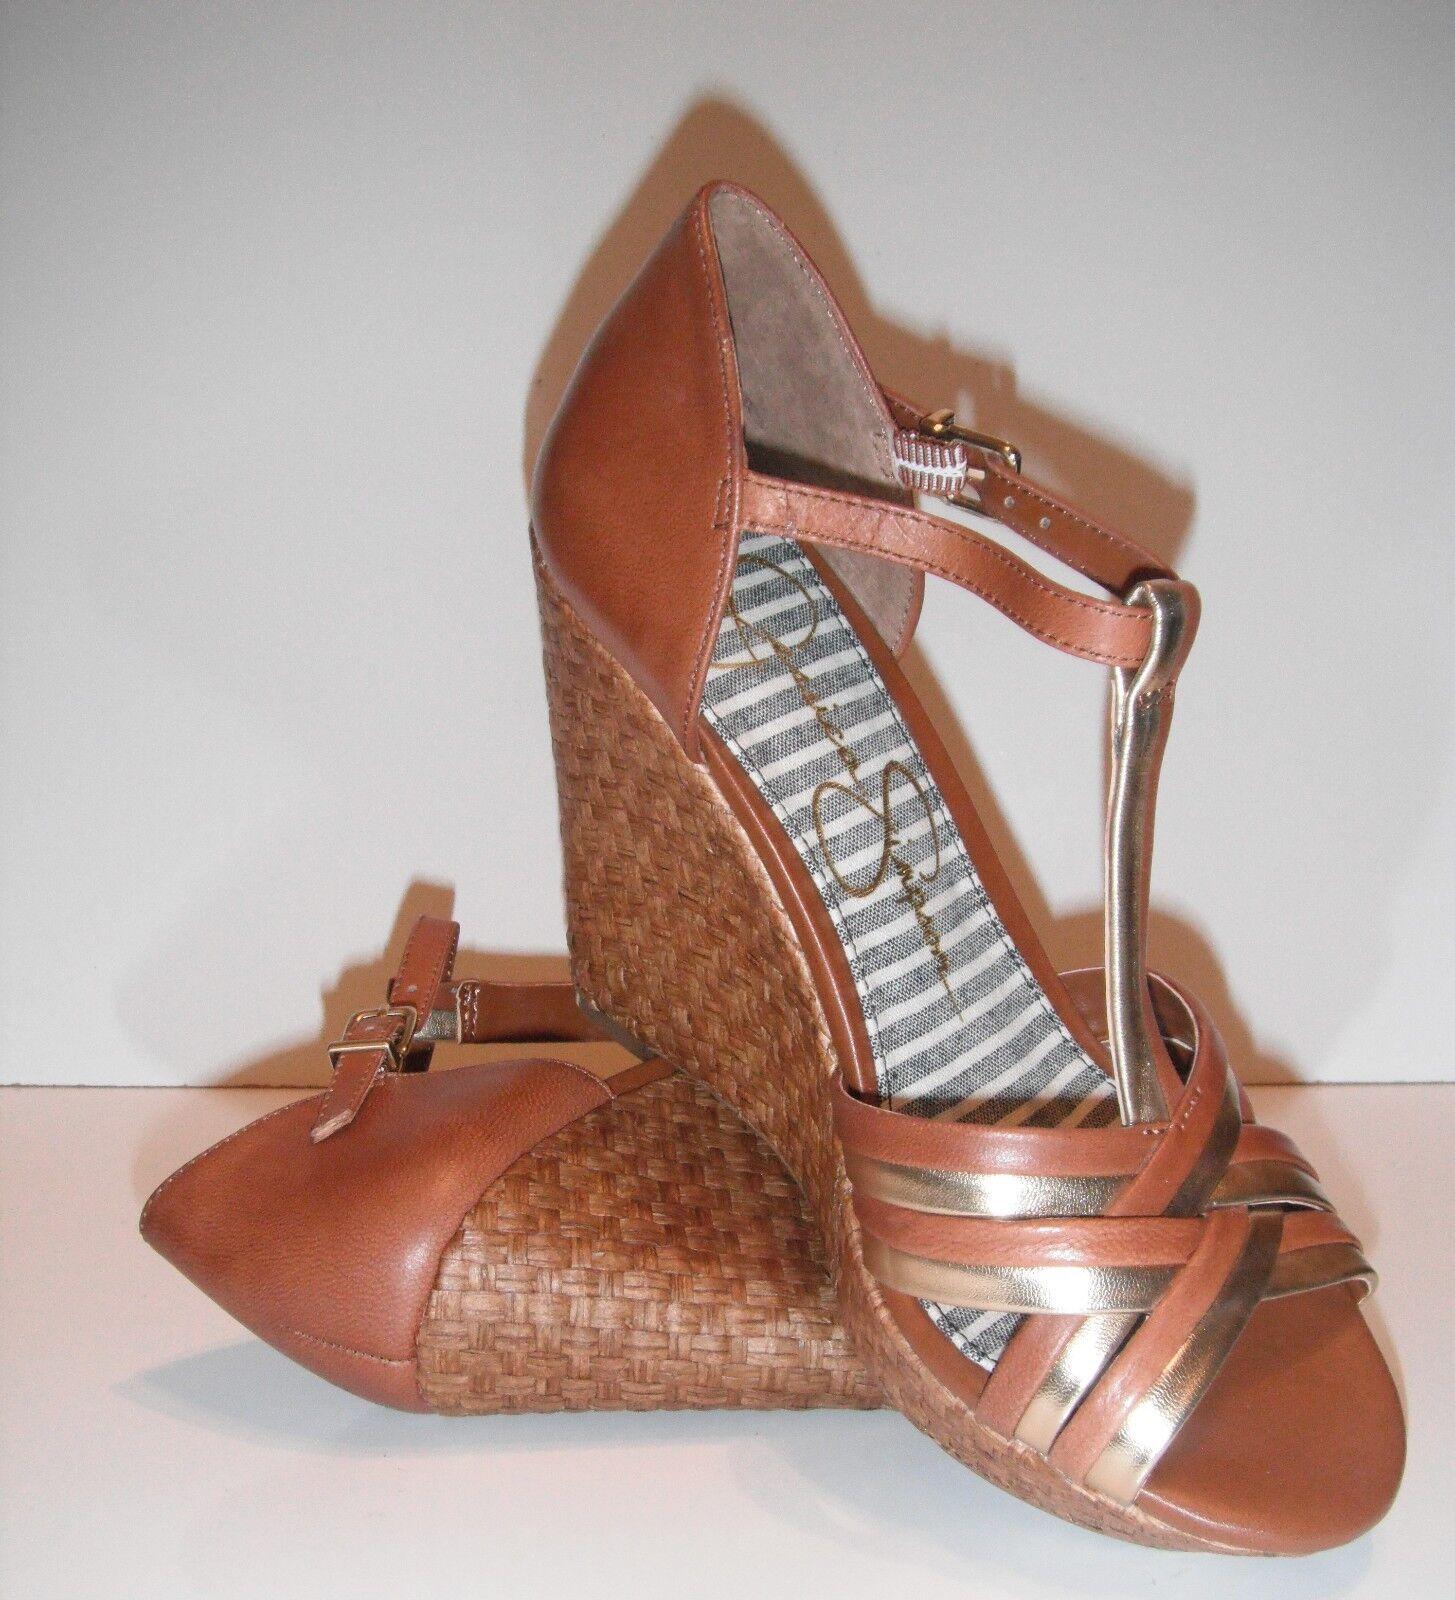 0bd4175c17c9d Jessica Simpson Calista Leather Sandal sz 8.5M NIB ygbqia4941-Pumps ...